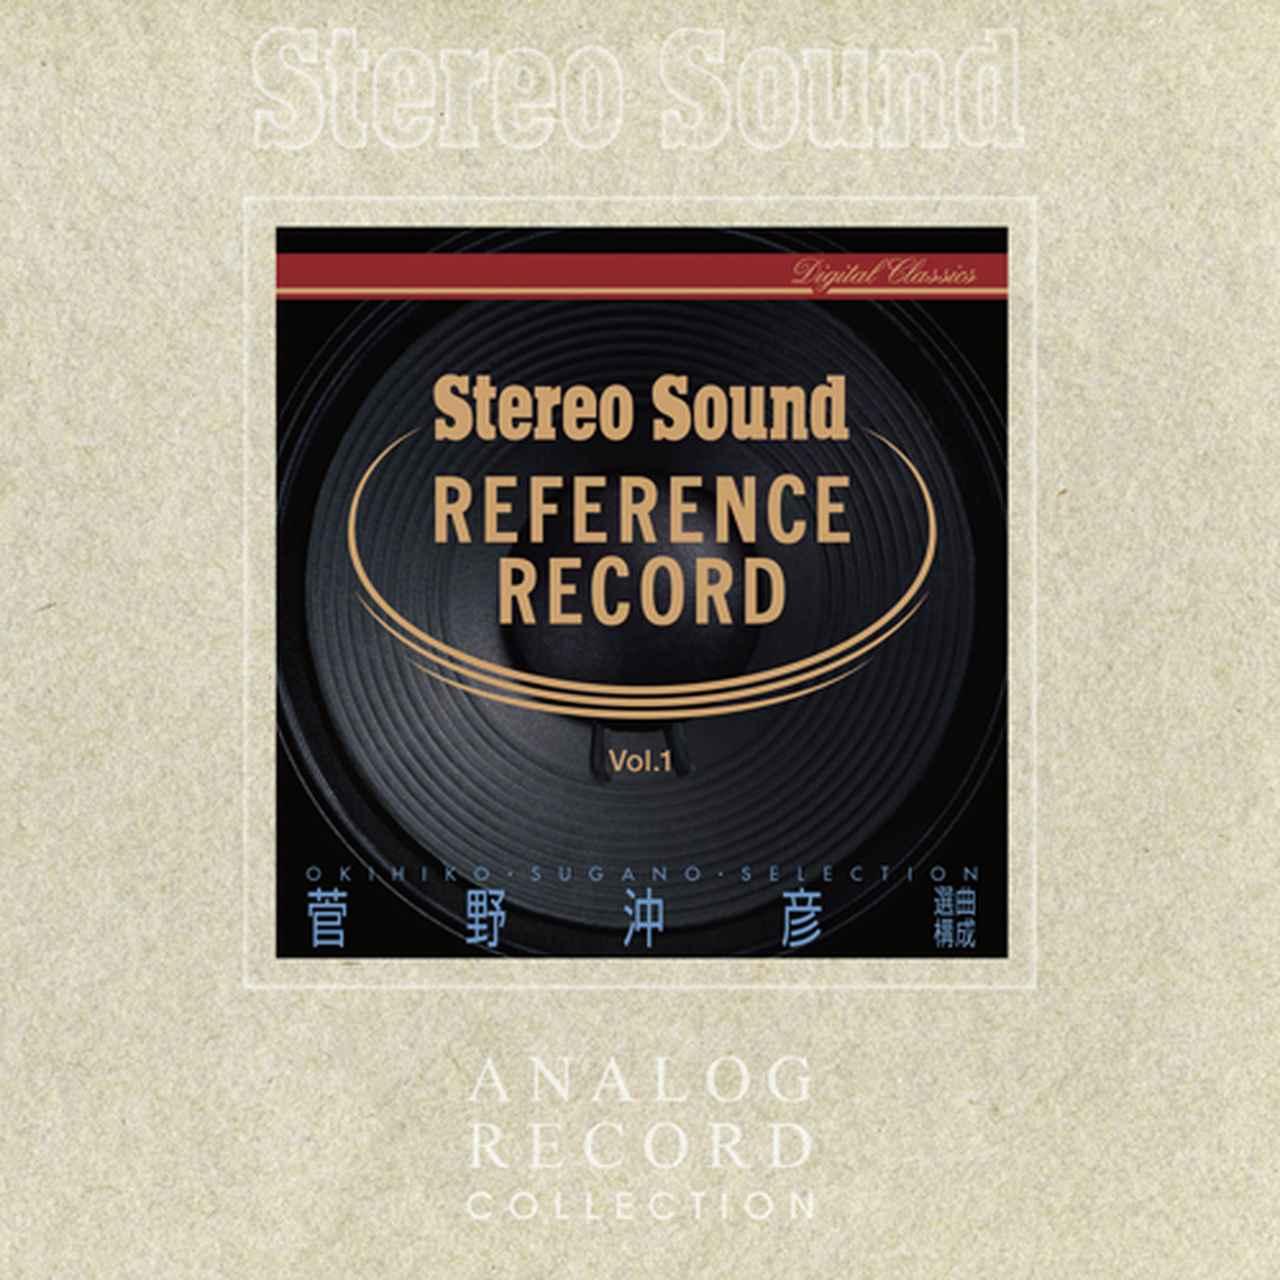 Images : 2番目の画像 - オーディオユニオンデイでお聴きいただけるステレオサウンド制作のアナログレコード - Stereo Sound ONLINE